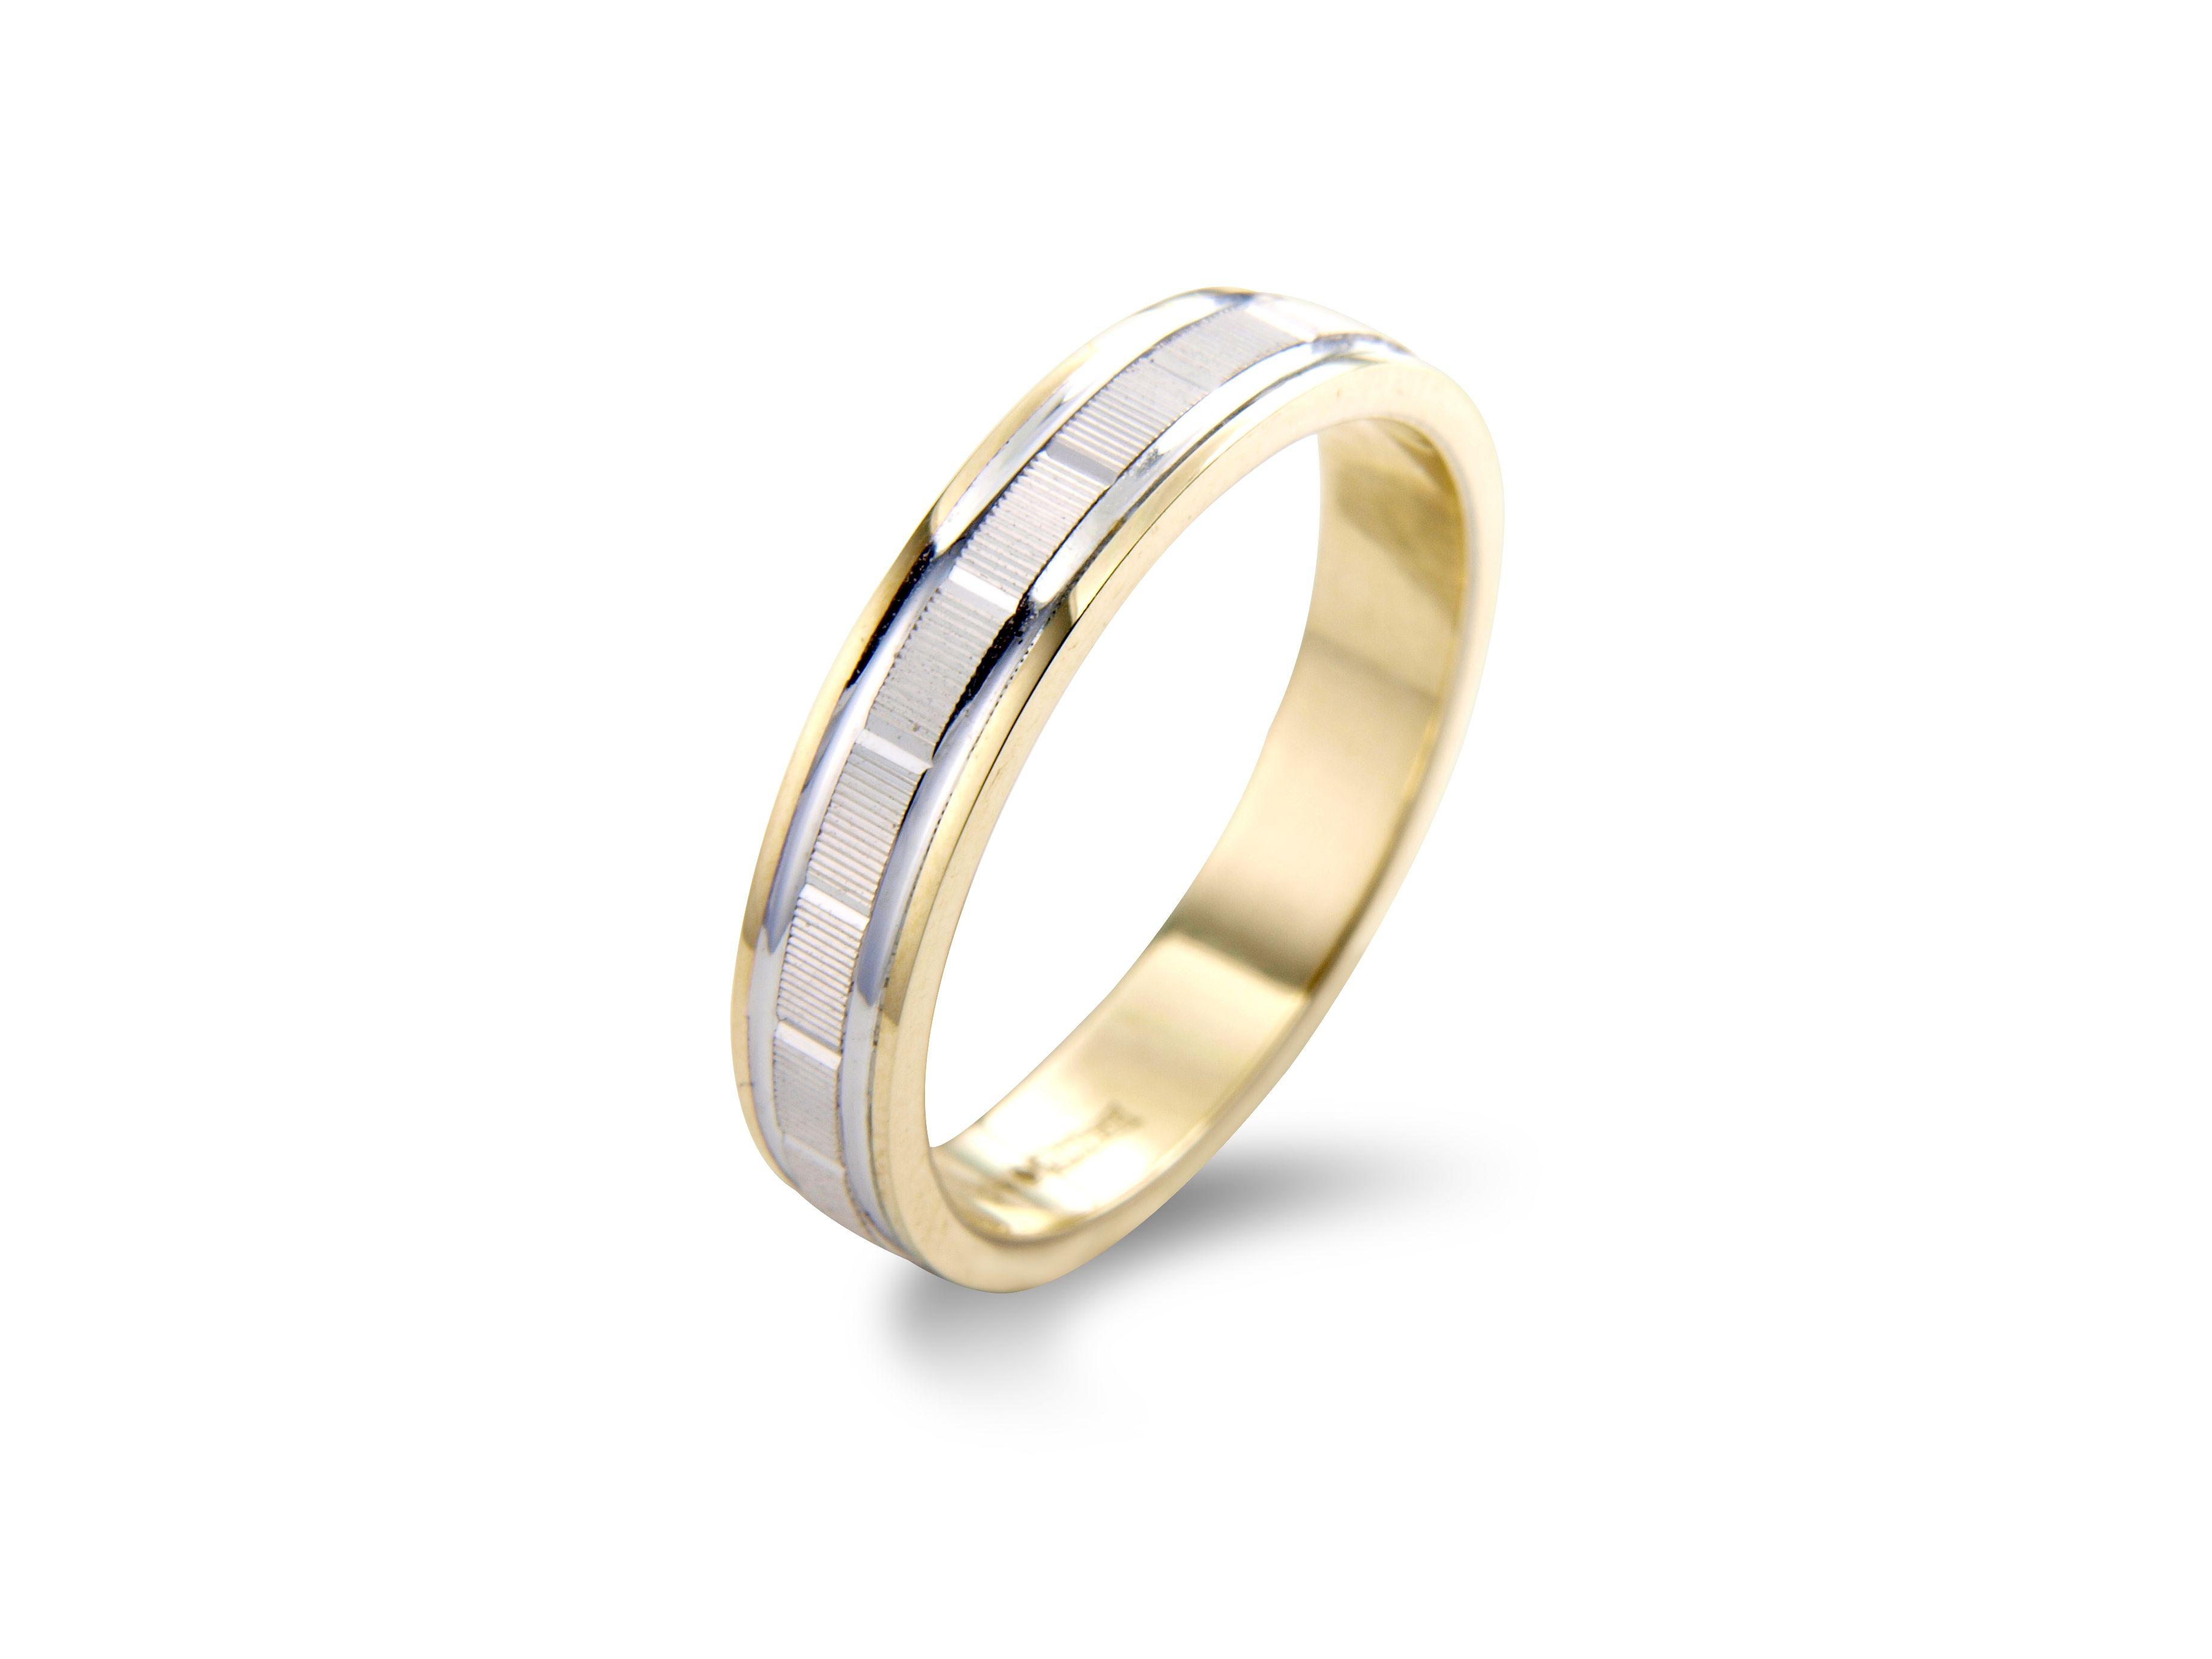 Bi Metal Wedding Ring Combining Yellow And White Gold Textured Pattern On